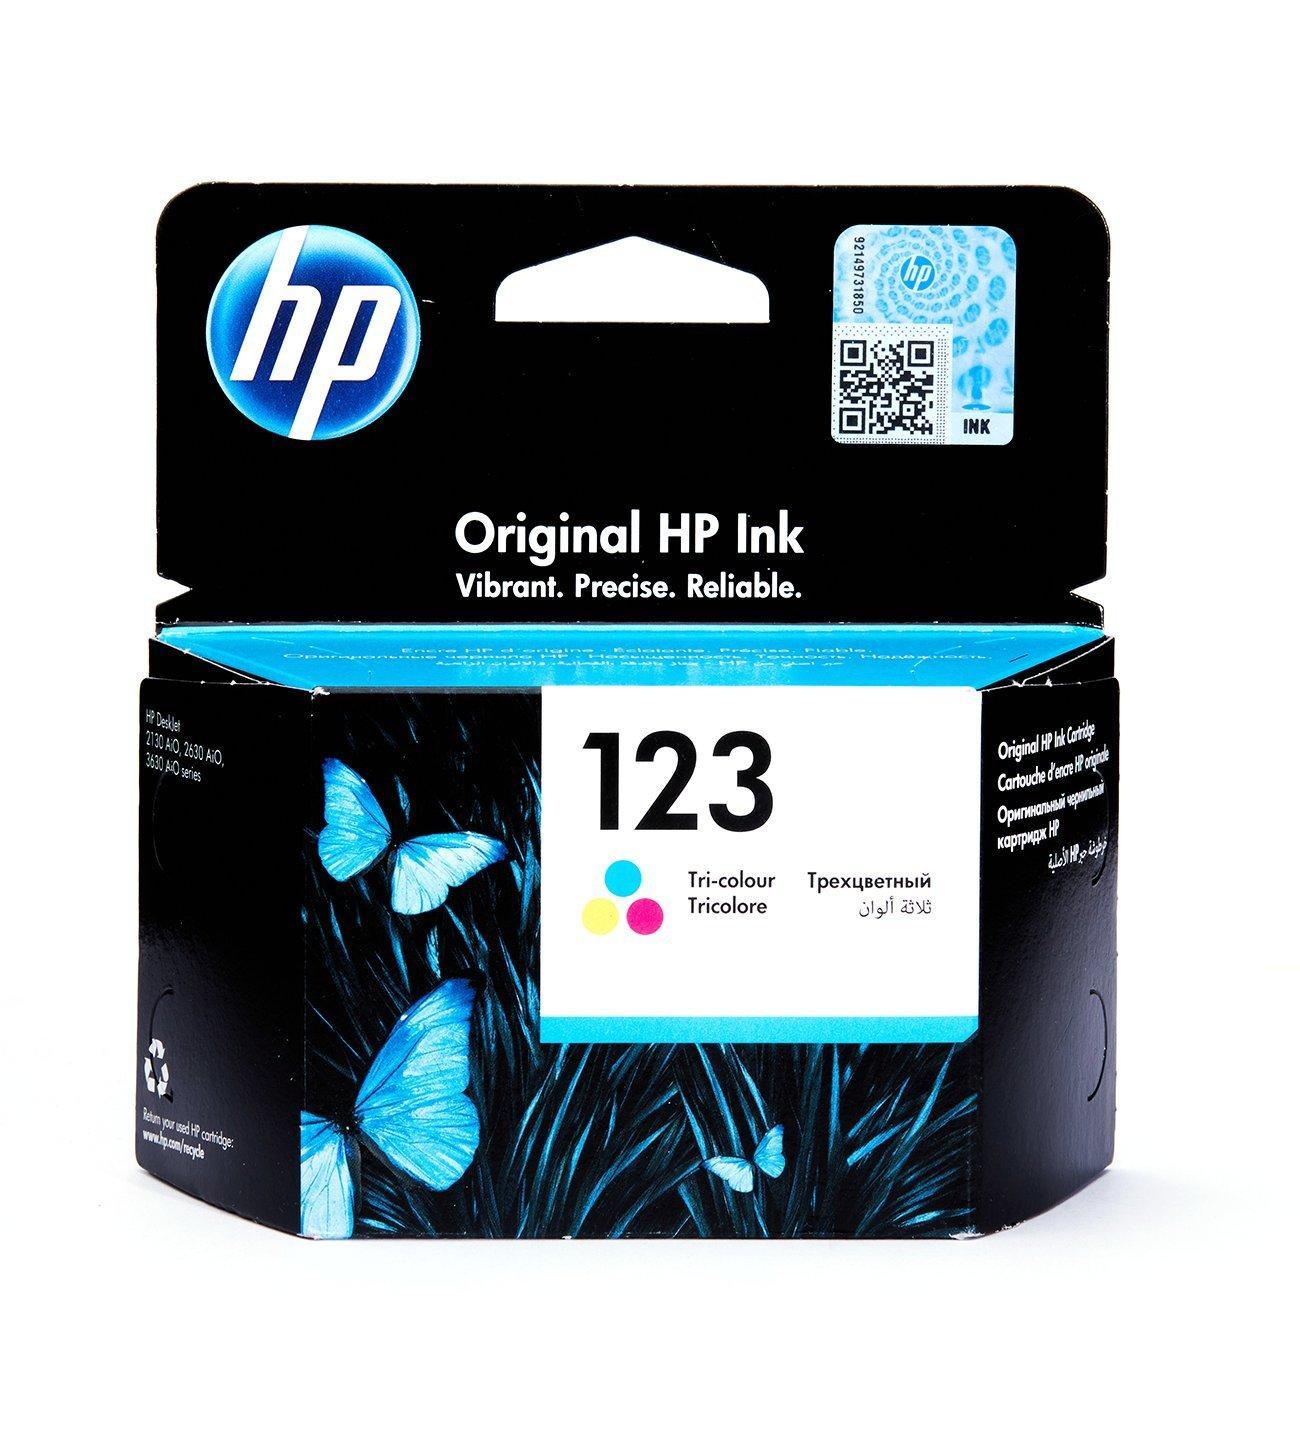 HP DeskJet 2630 All-in-One Prnter - Print, copy, scan